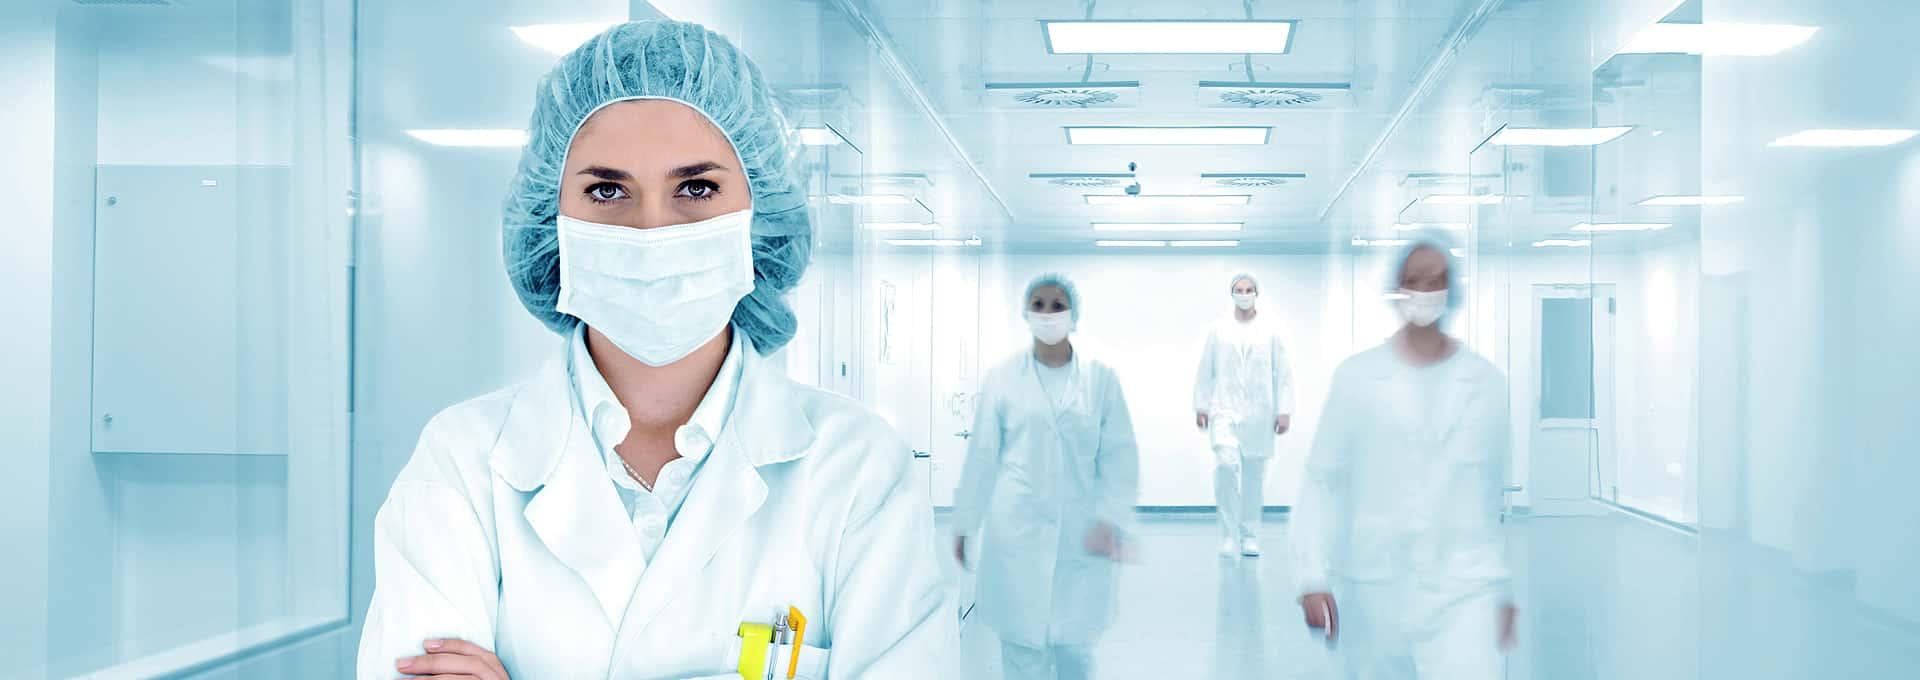 Ozotec Medical